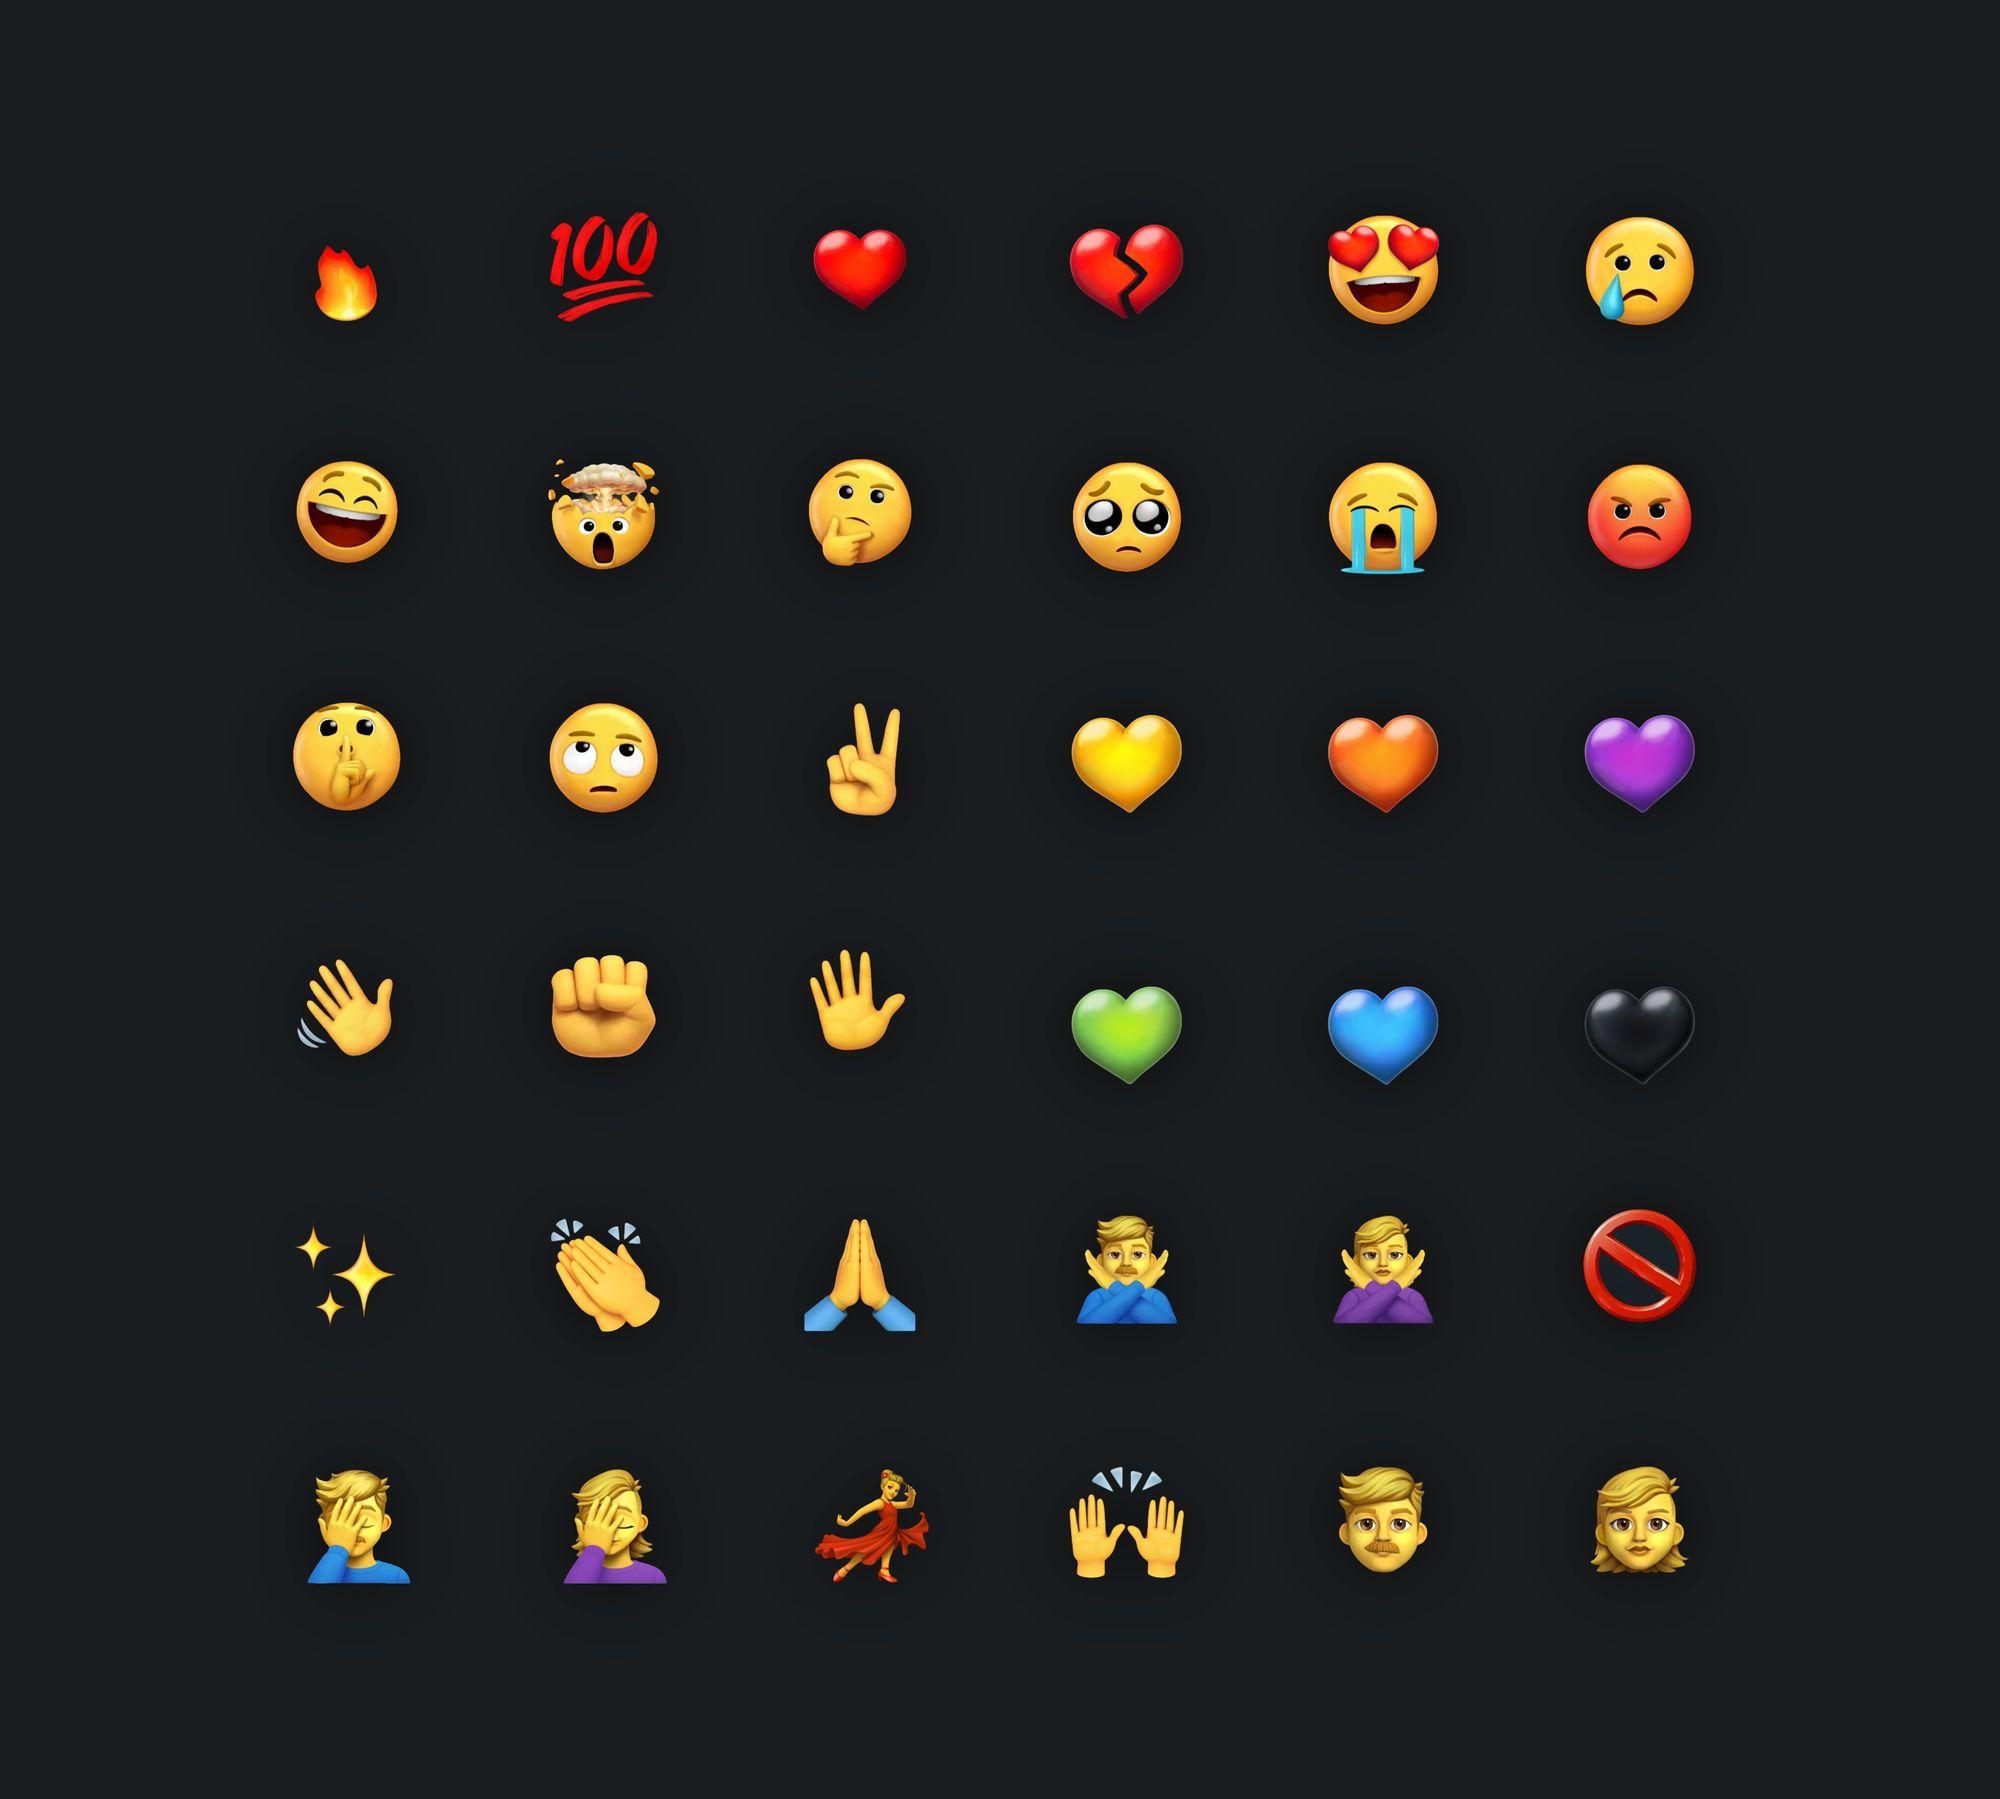 twemoji-new-designs-2021-emojipedia